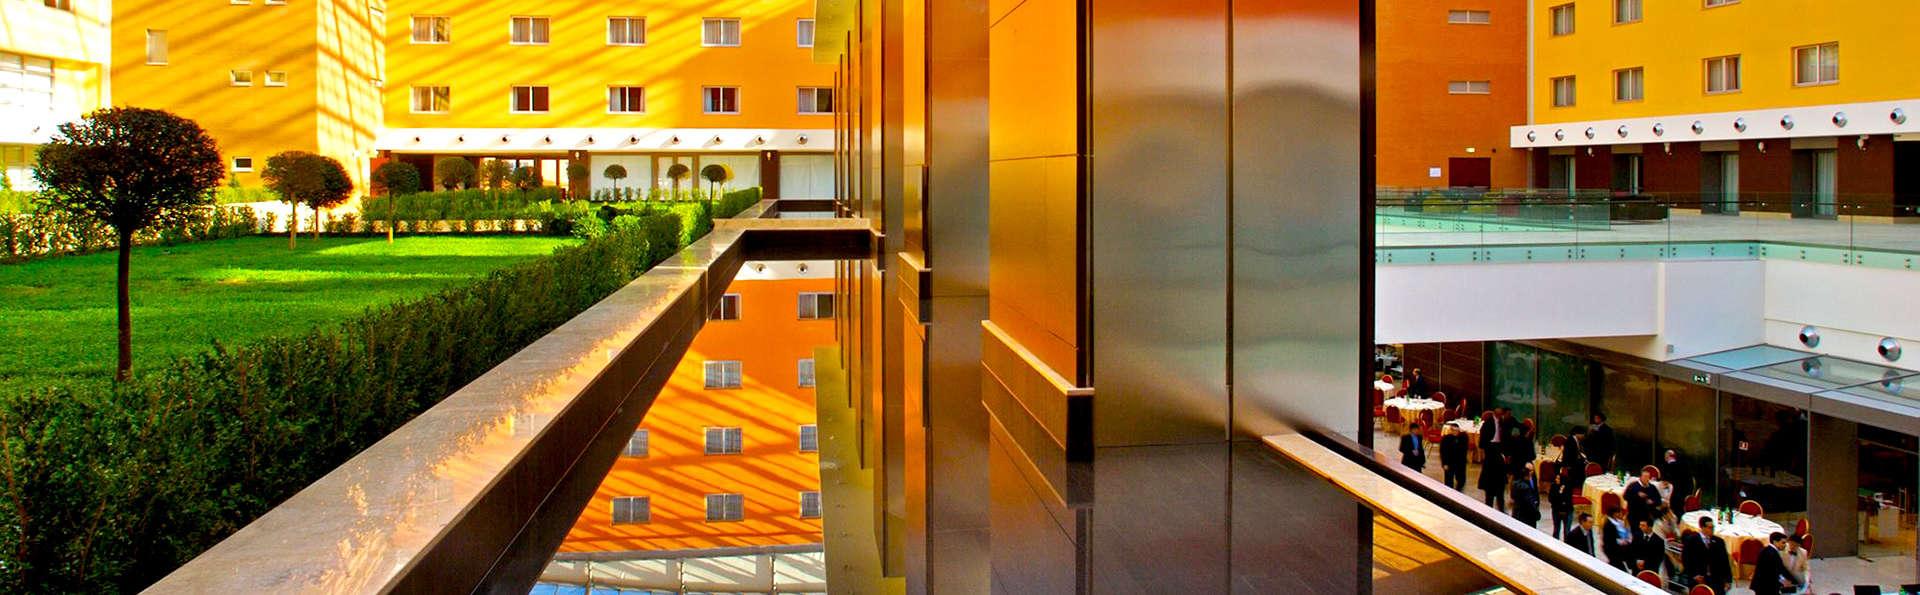 Golden Tulip Plaza Caserta - Edit_view.jpg